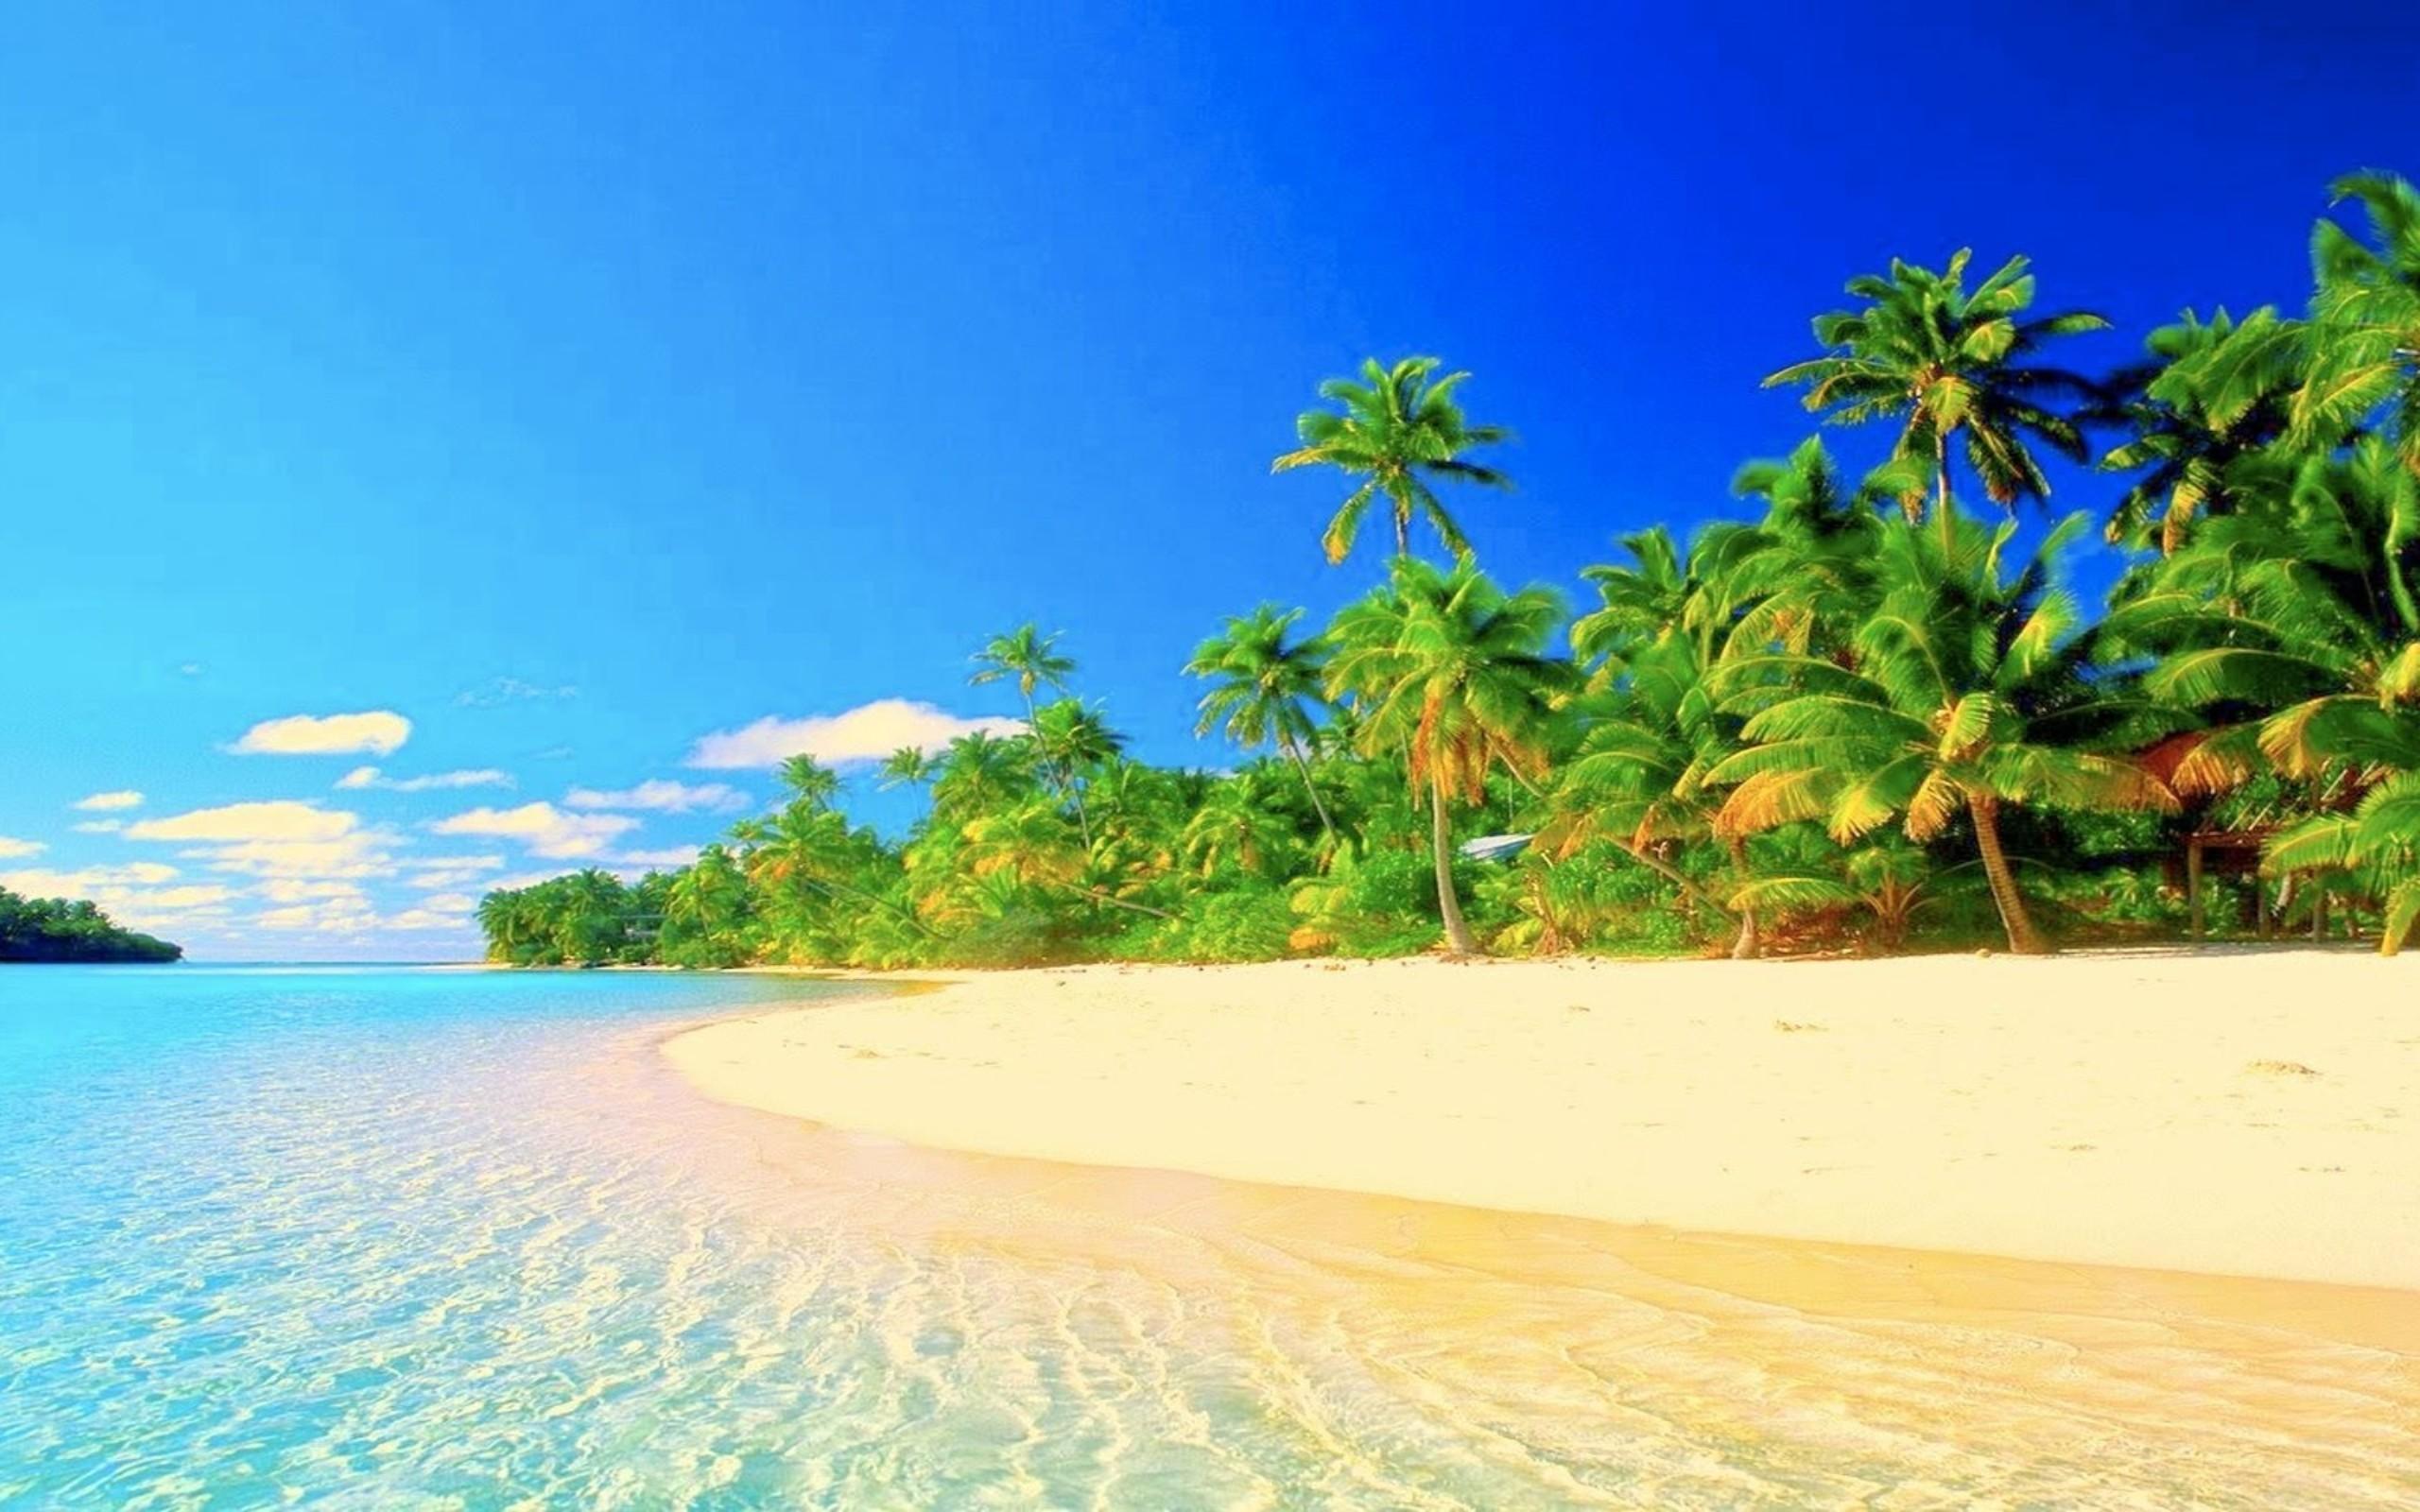 Tropical Paradise Beach Hd Wallpaper For Nexus 7 Screens: Tropical Wallpaper Desktop (46+ Pictures